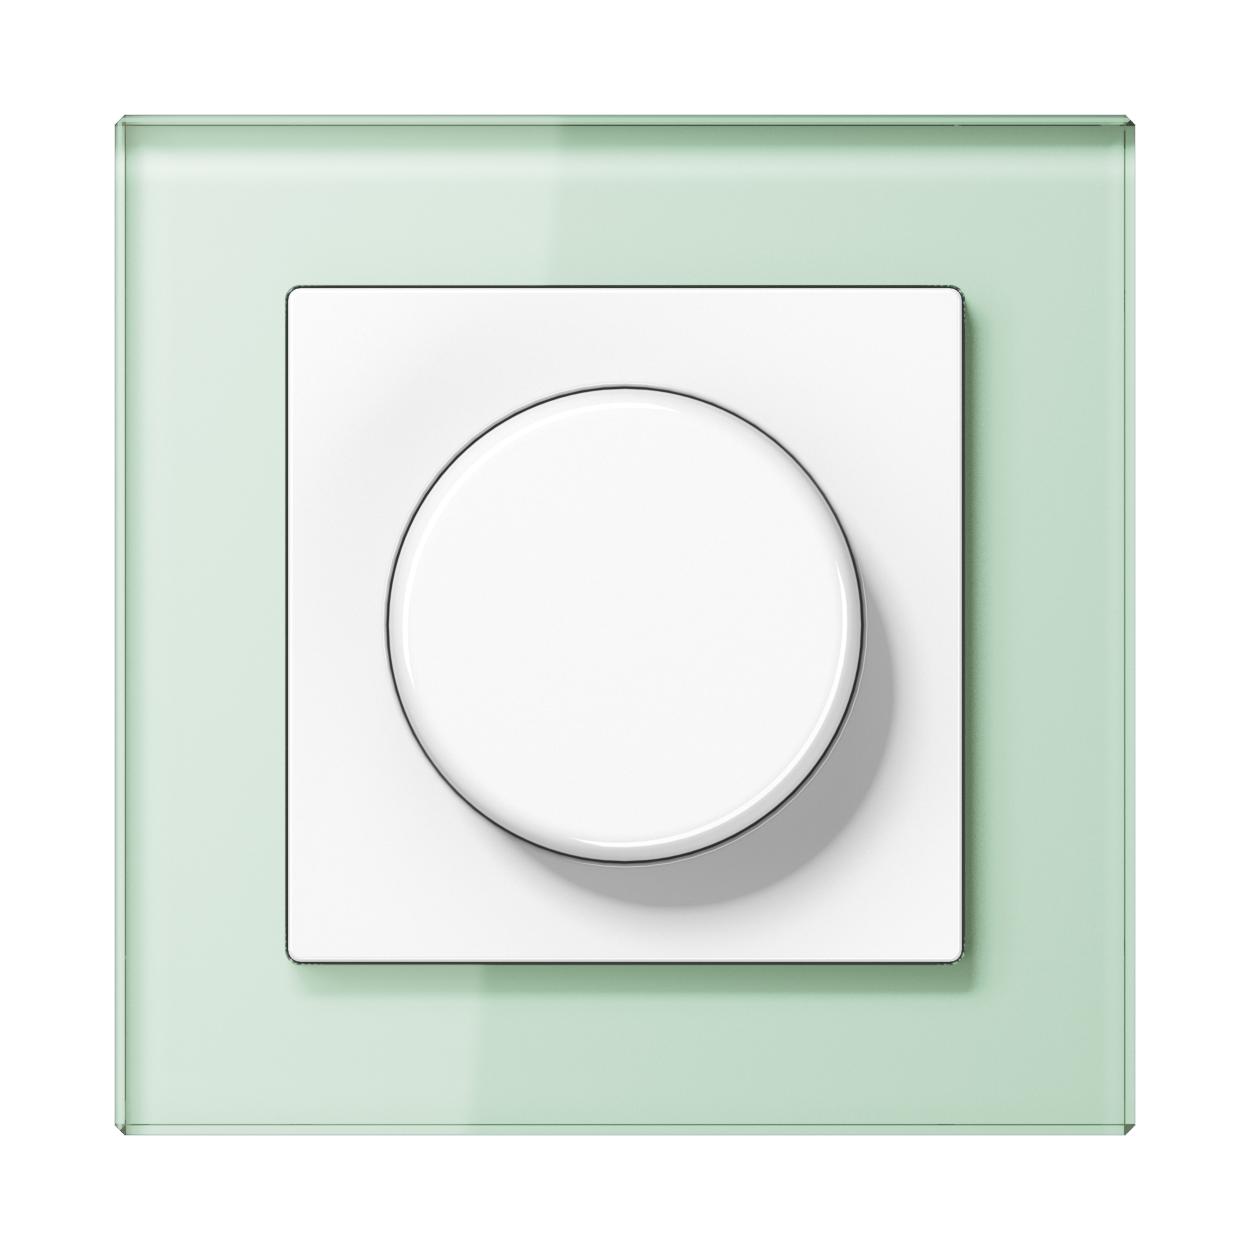 JUNG_AC_GL_soft_white_dimmer